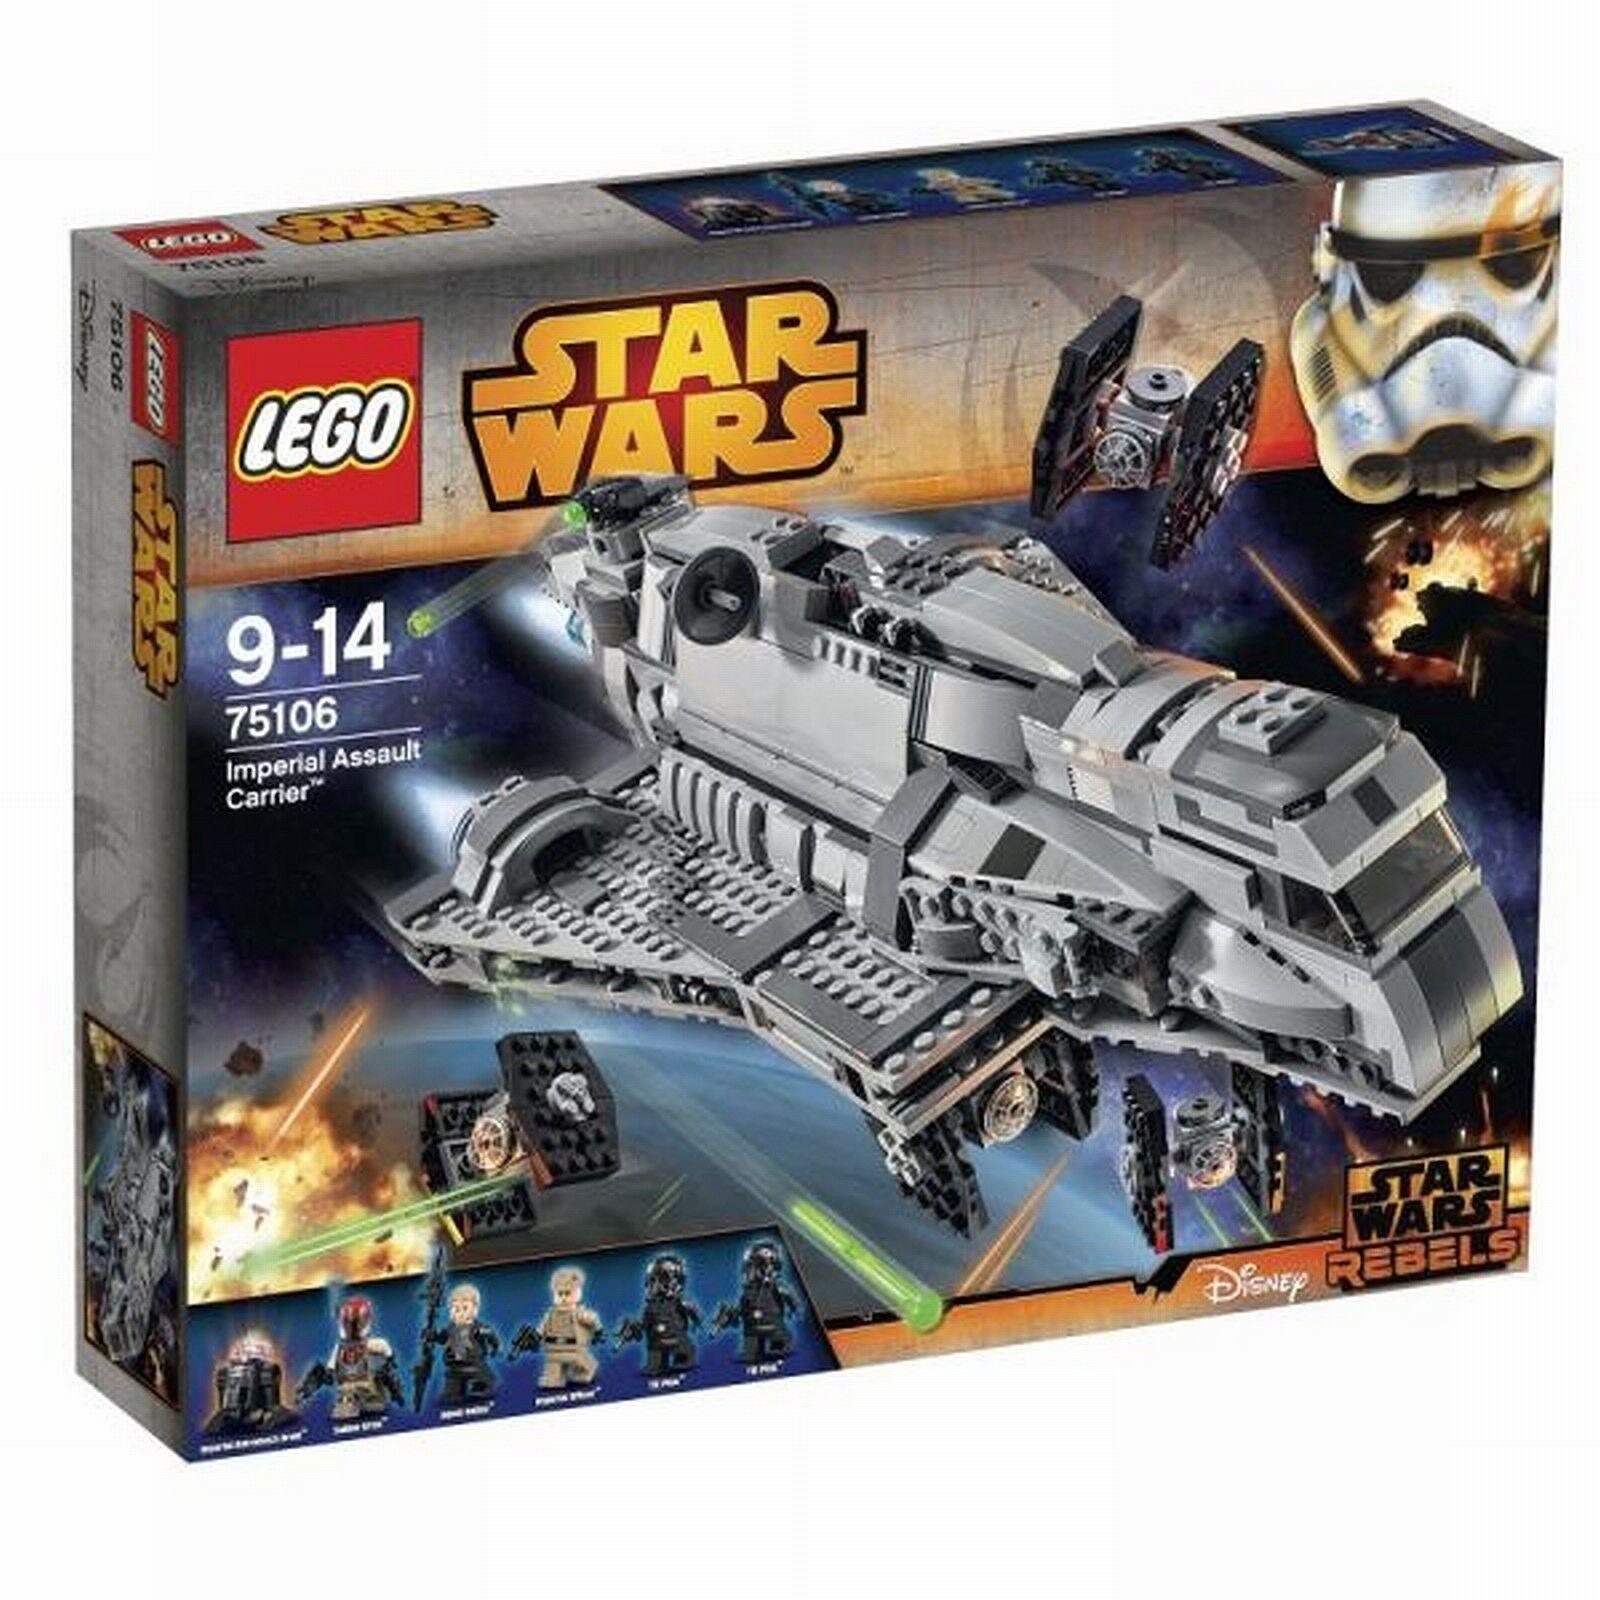 Lego Star Wars 75106 Imperial Assault Carrier  Spielzeug   brandtoys